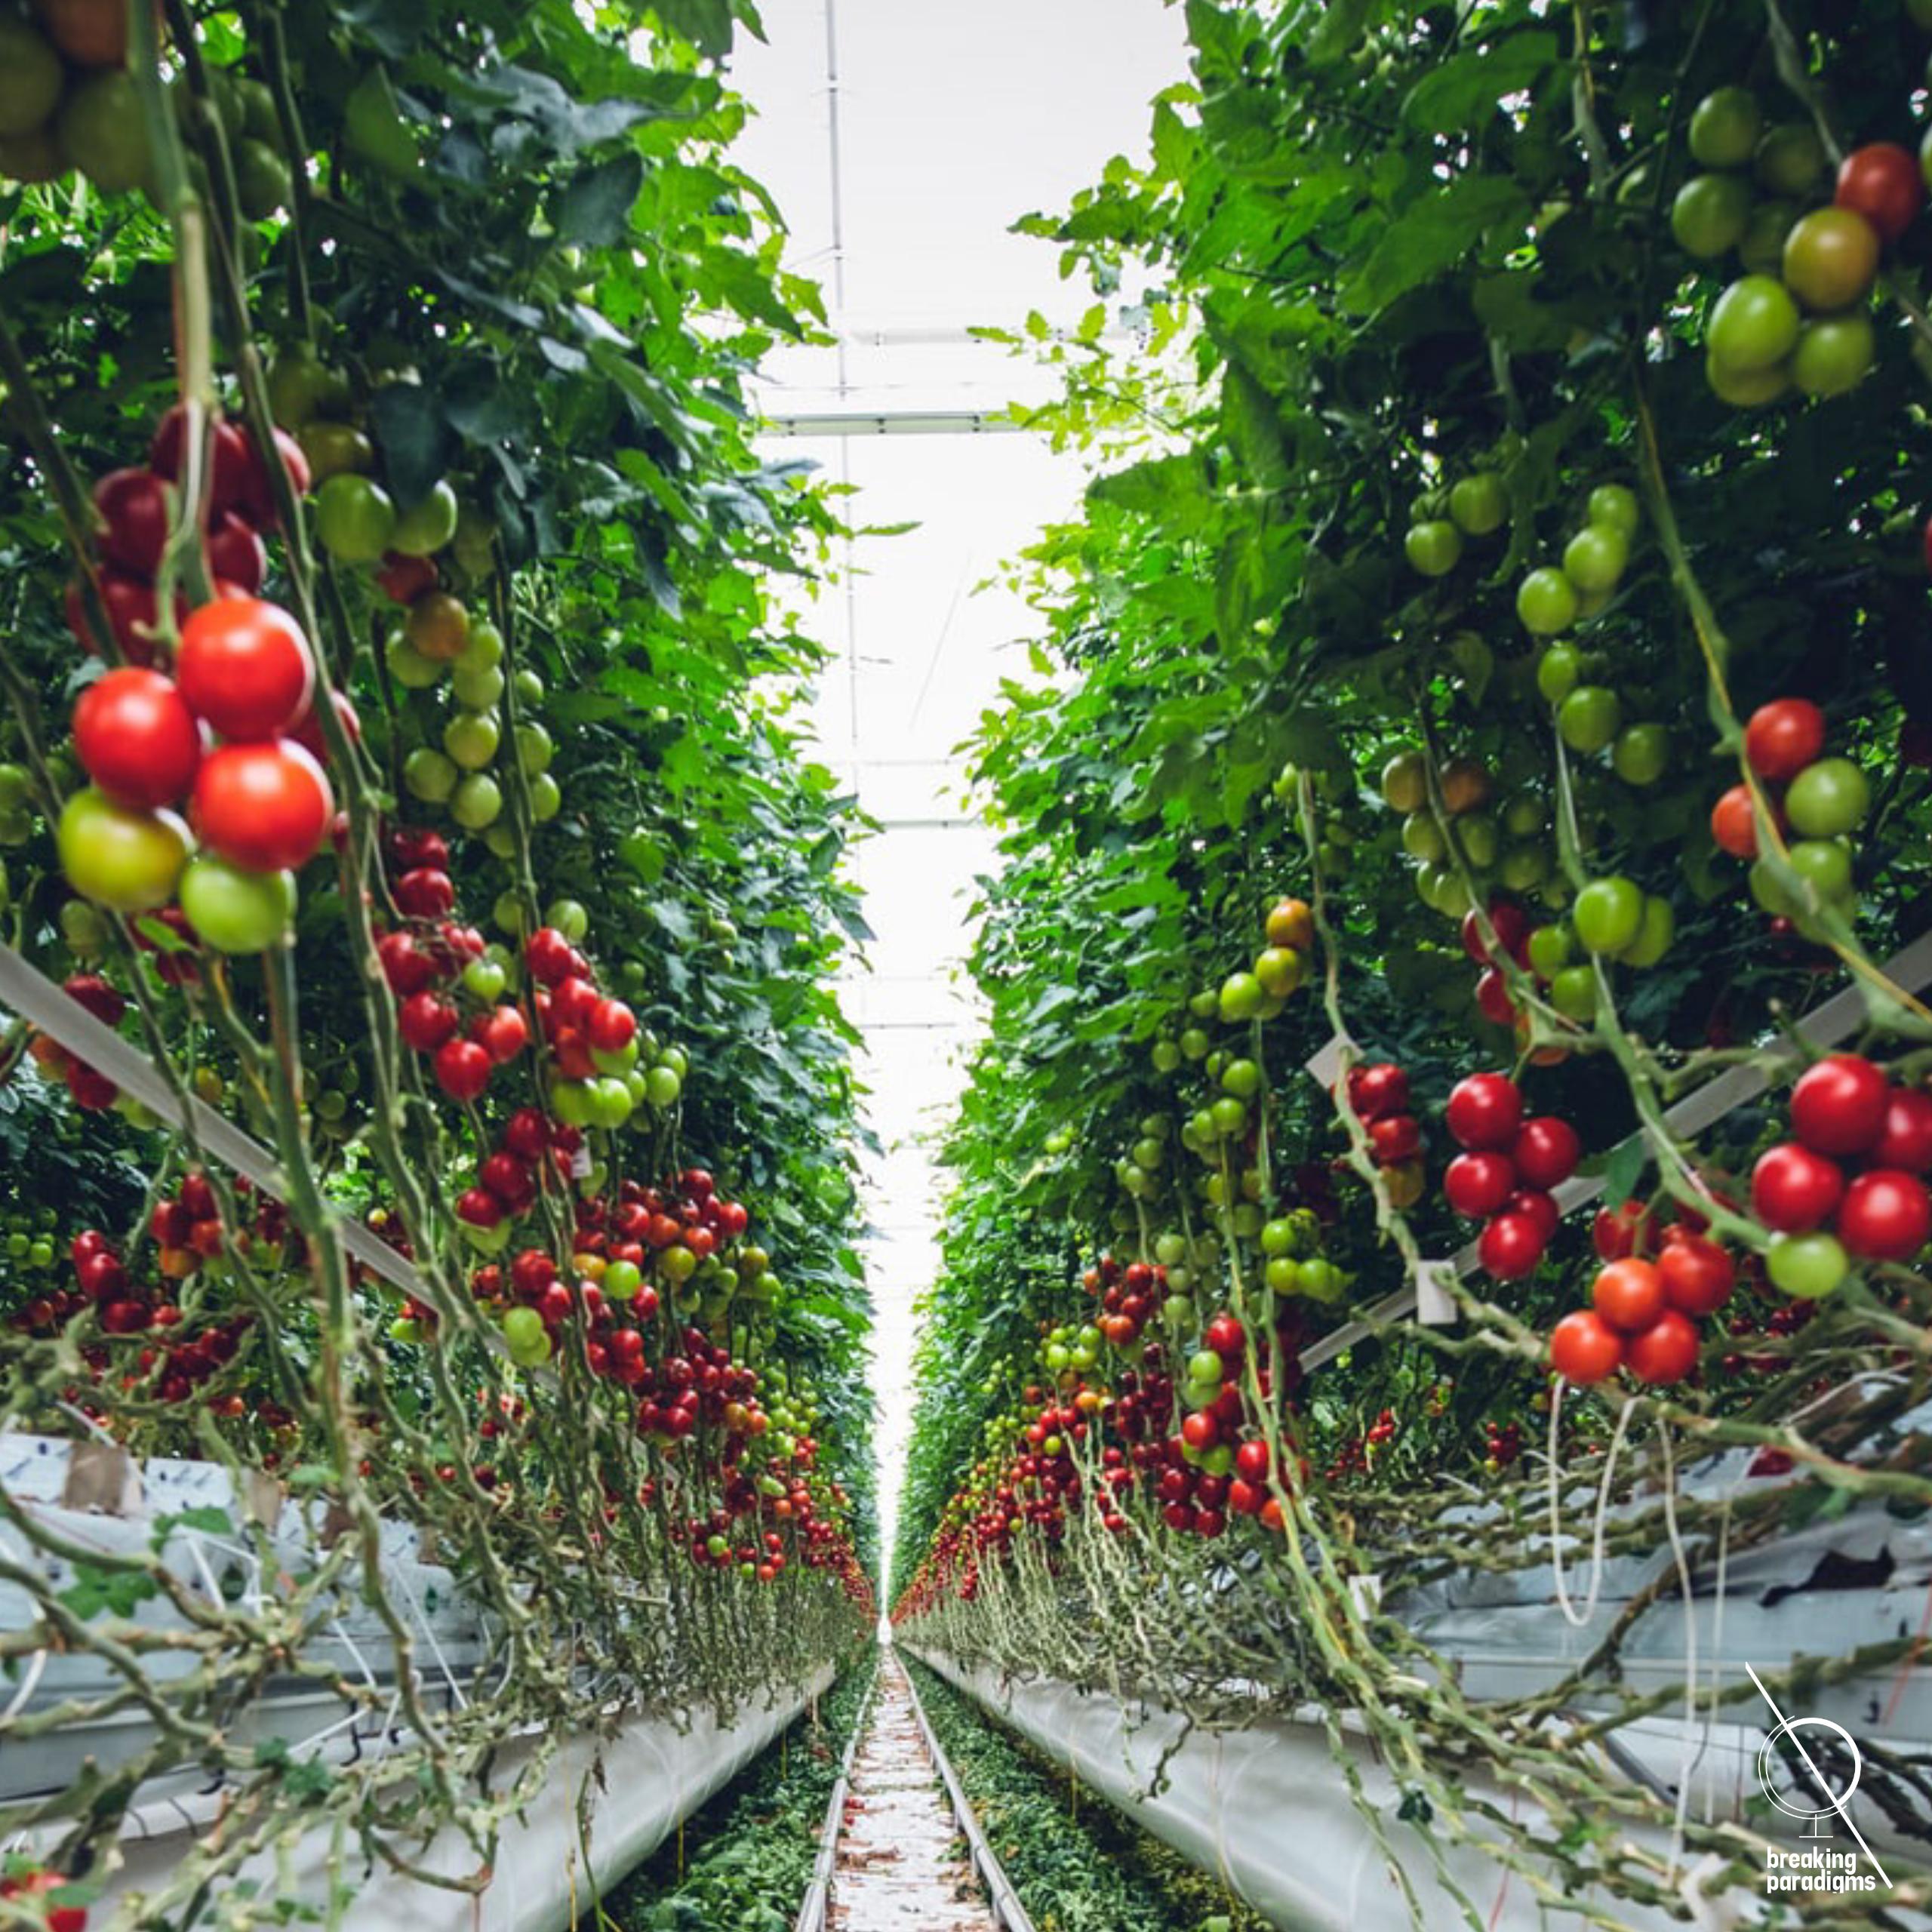 tomatoe plantation